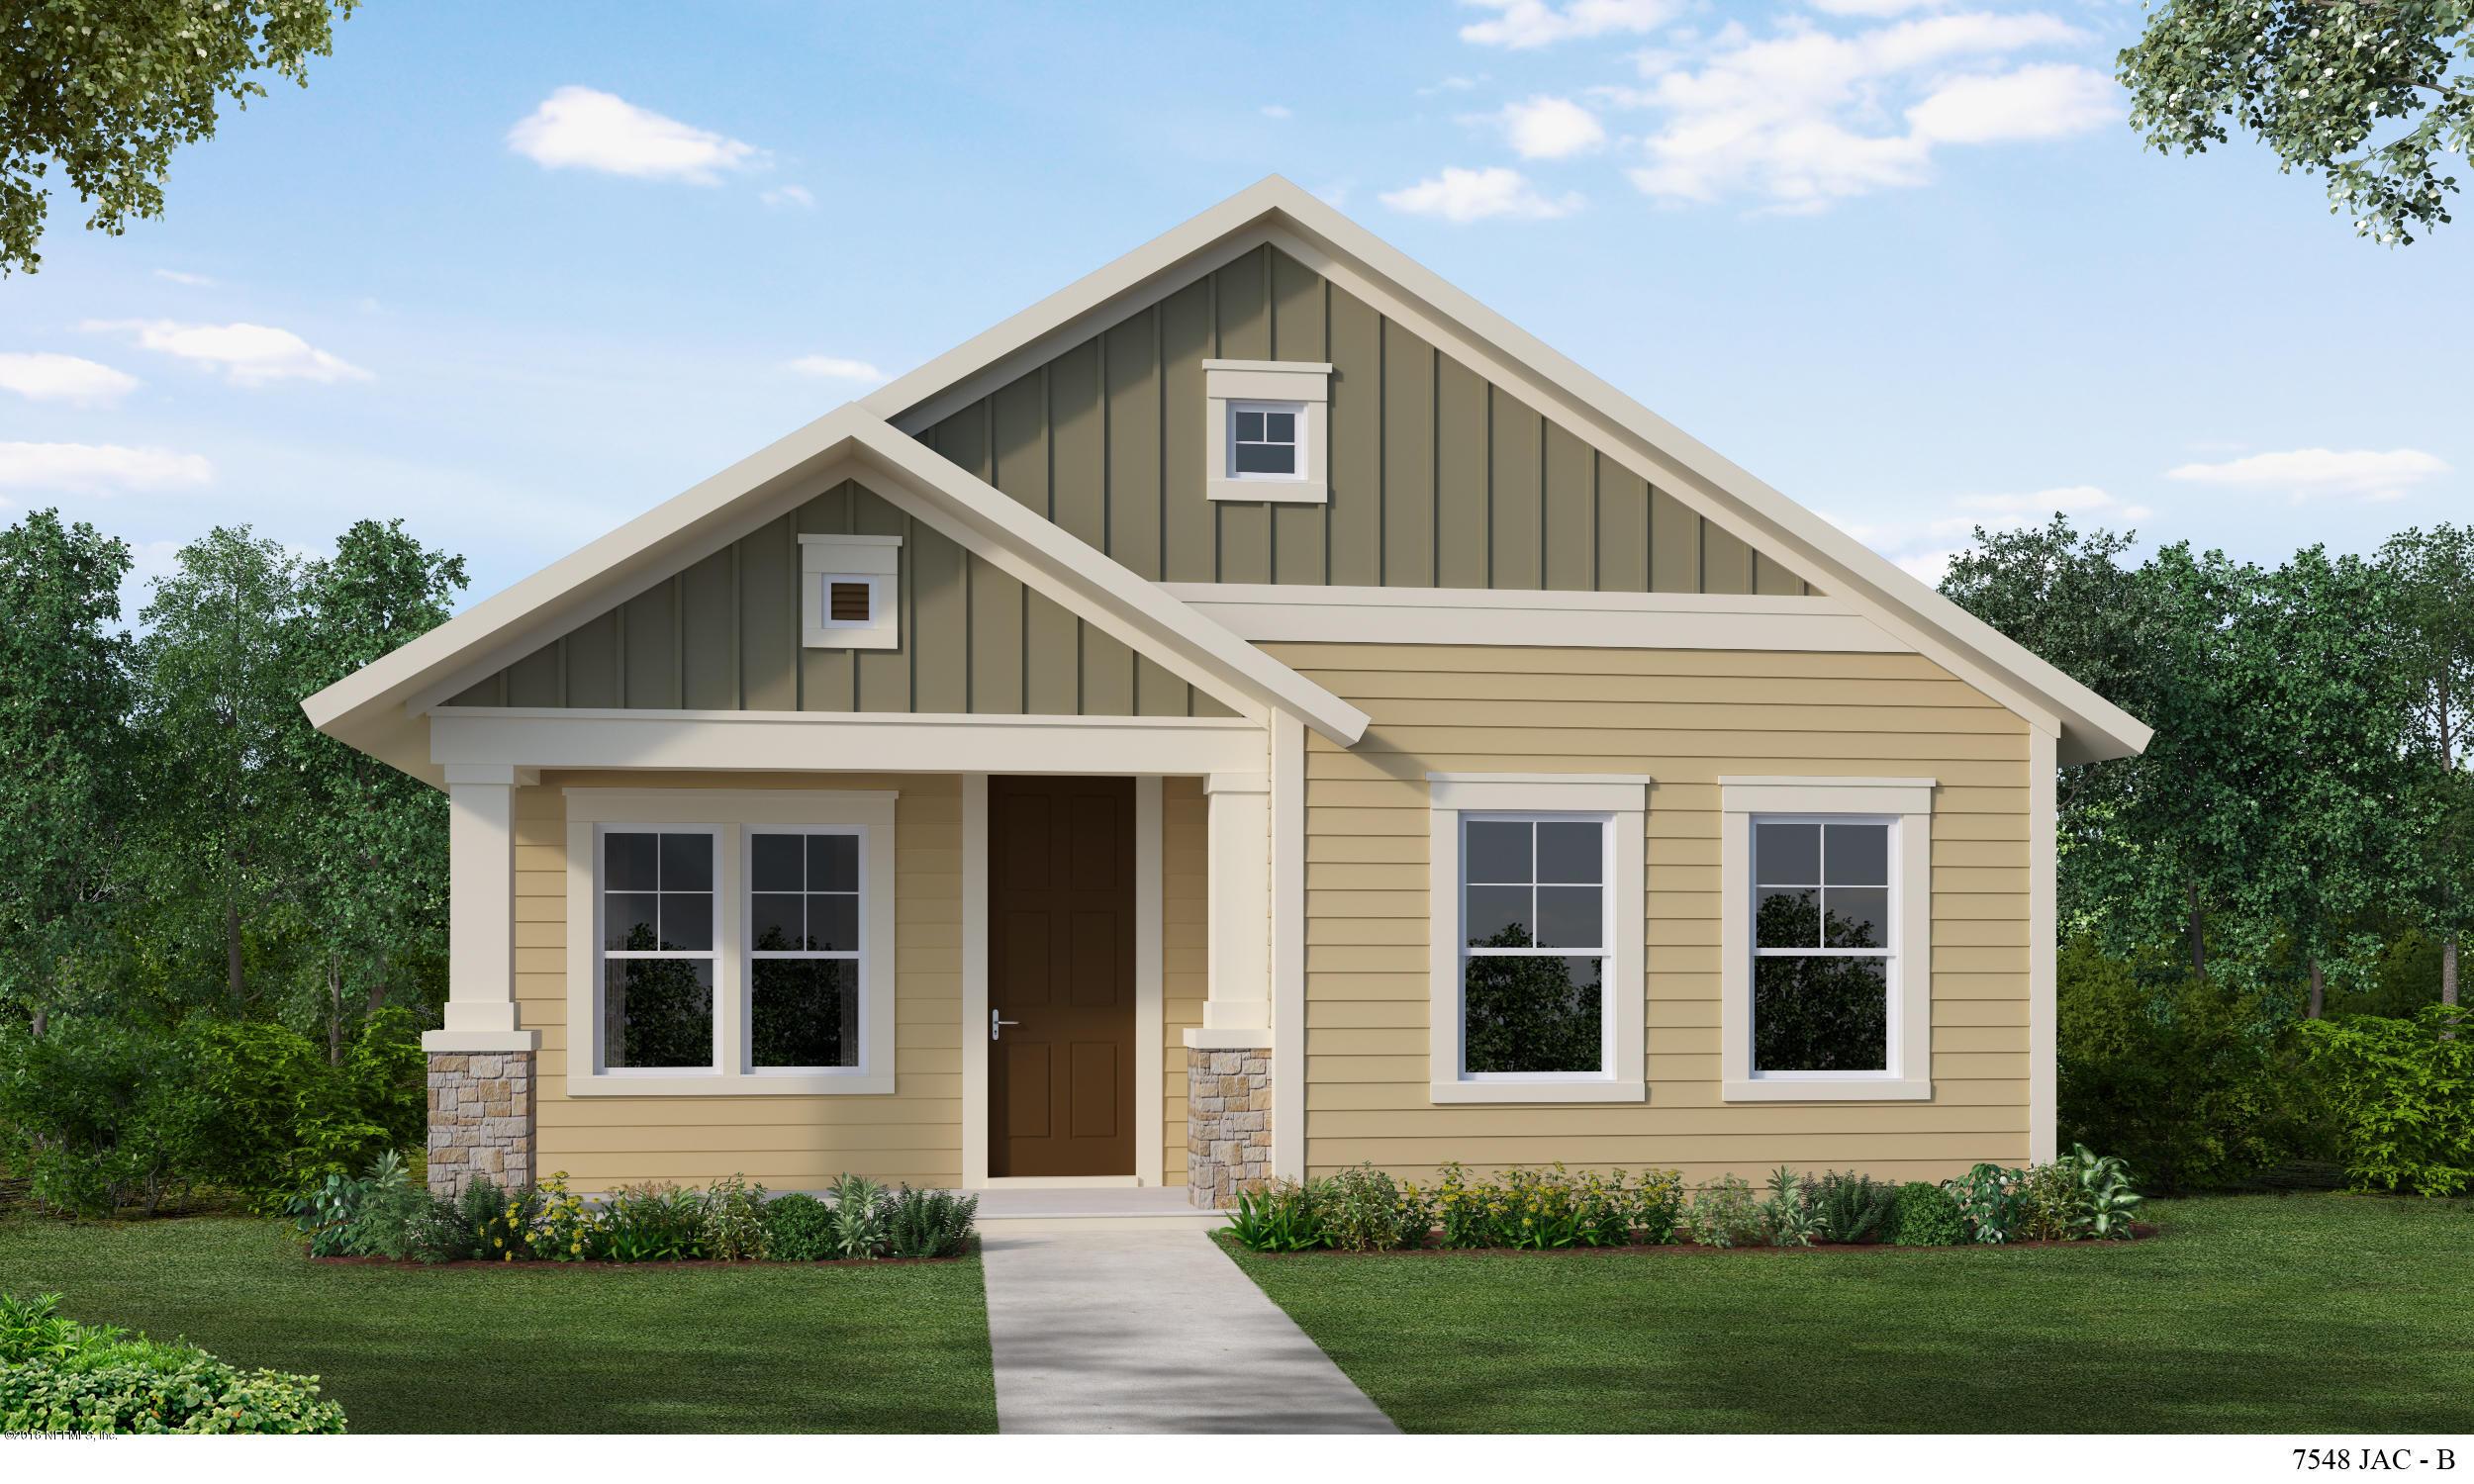 36 BURROWS, PONTE VEDRA, FLORIDA 32081, 3 Bedrooms Bedrooms, ,2 BathroomsBathrooms,Residential - single family,For sale,BURROWS,962712